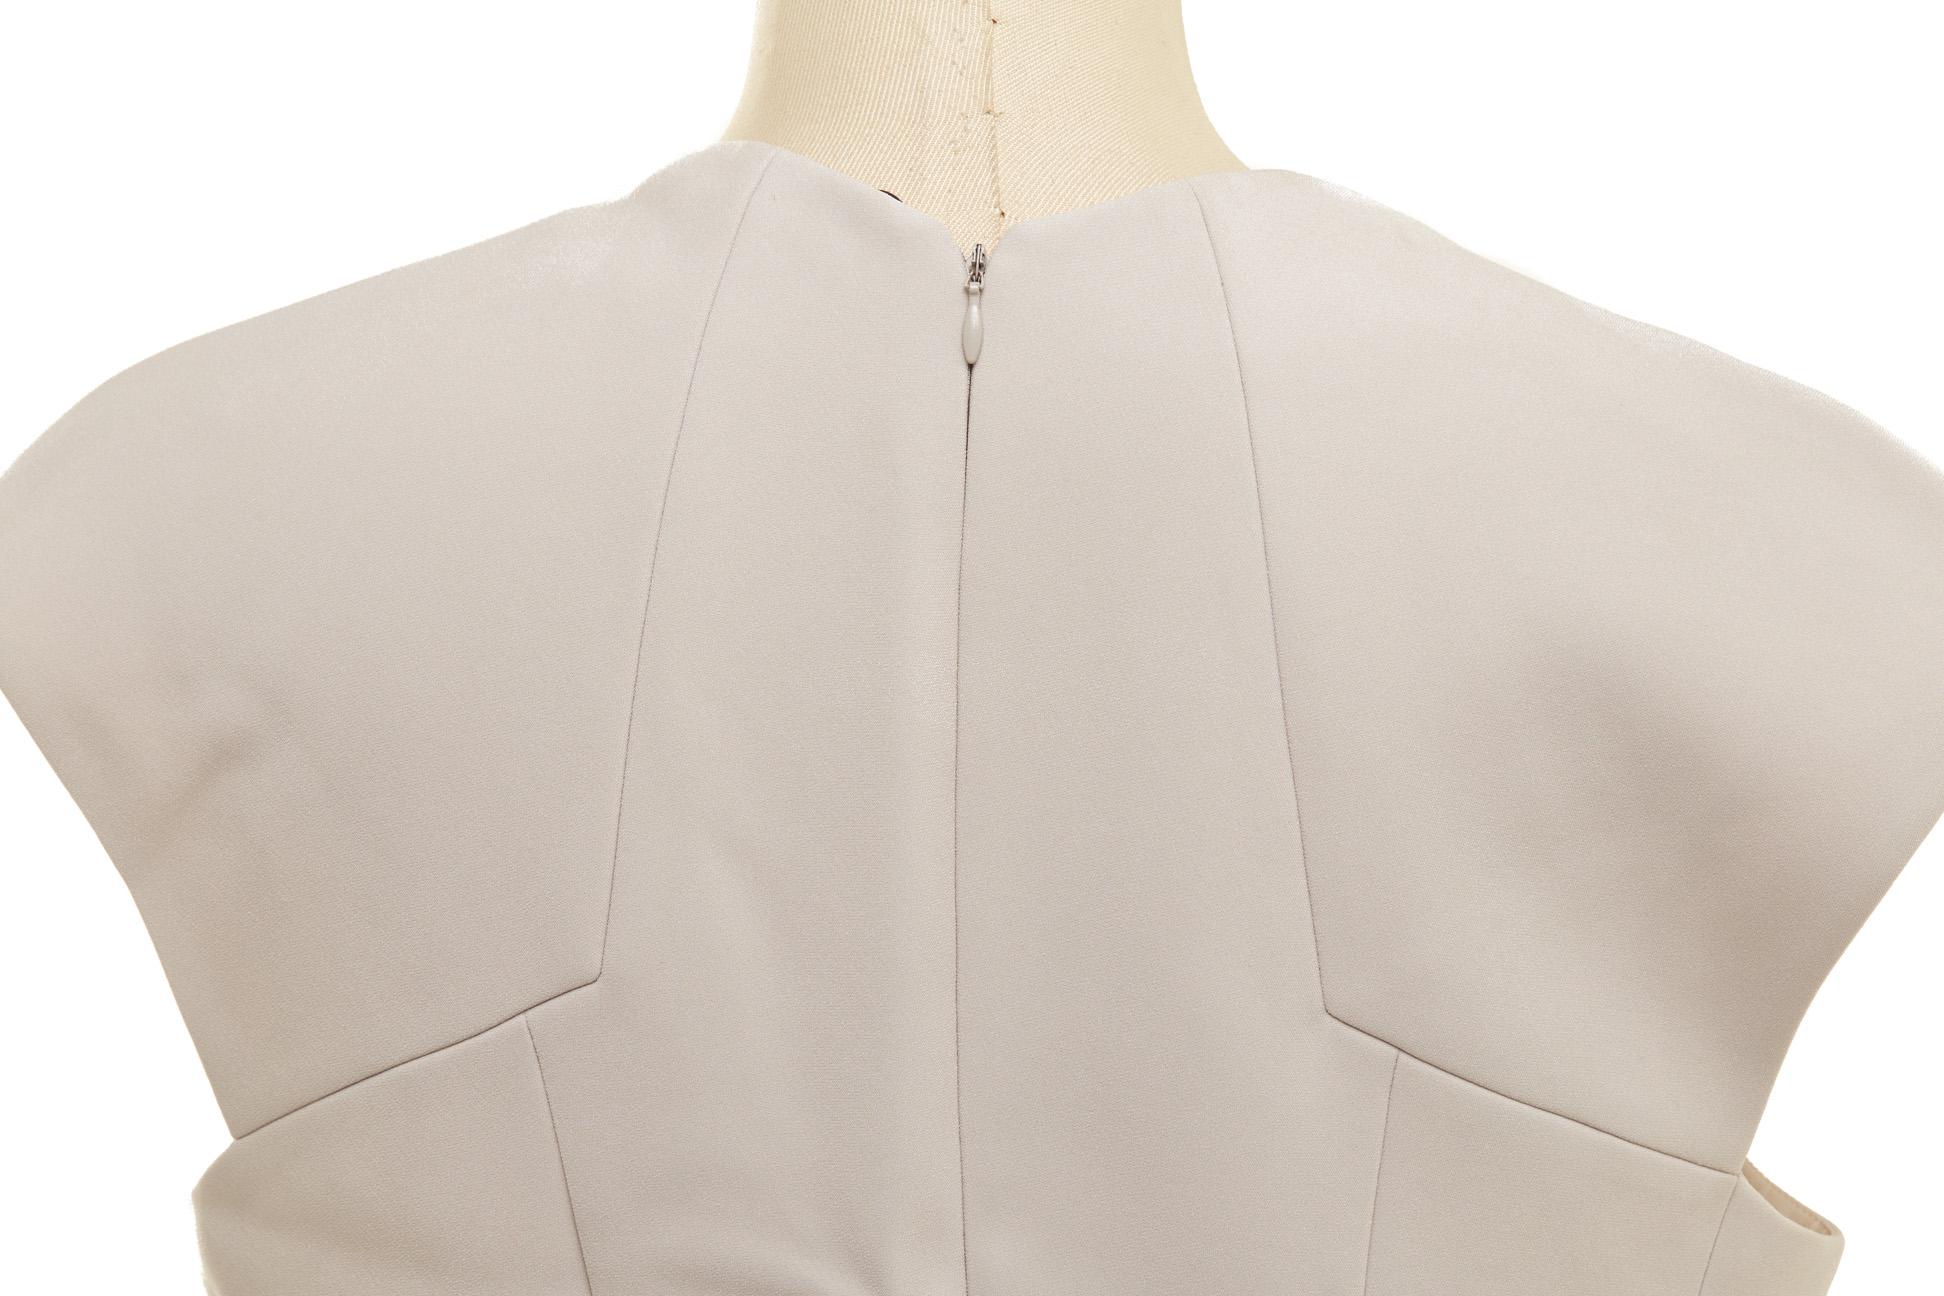 A BOTTEGA VENETA LIGHT GREY SHIFT DRESS - Image 3 of 3